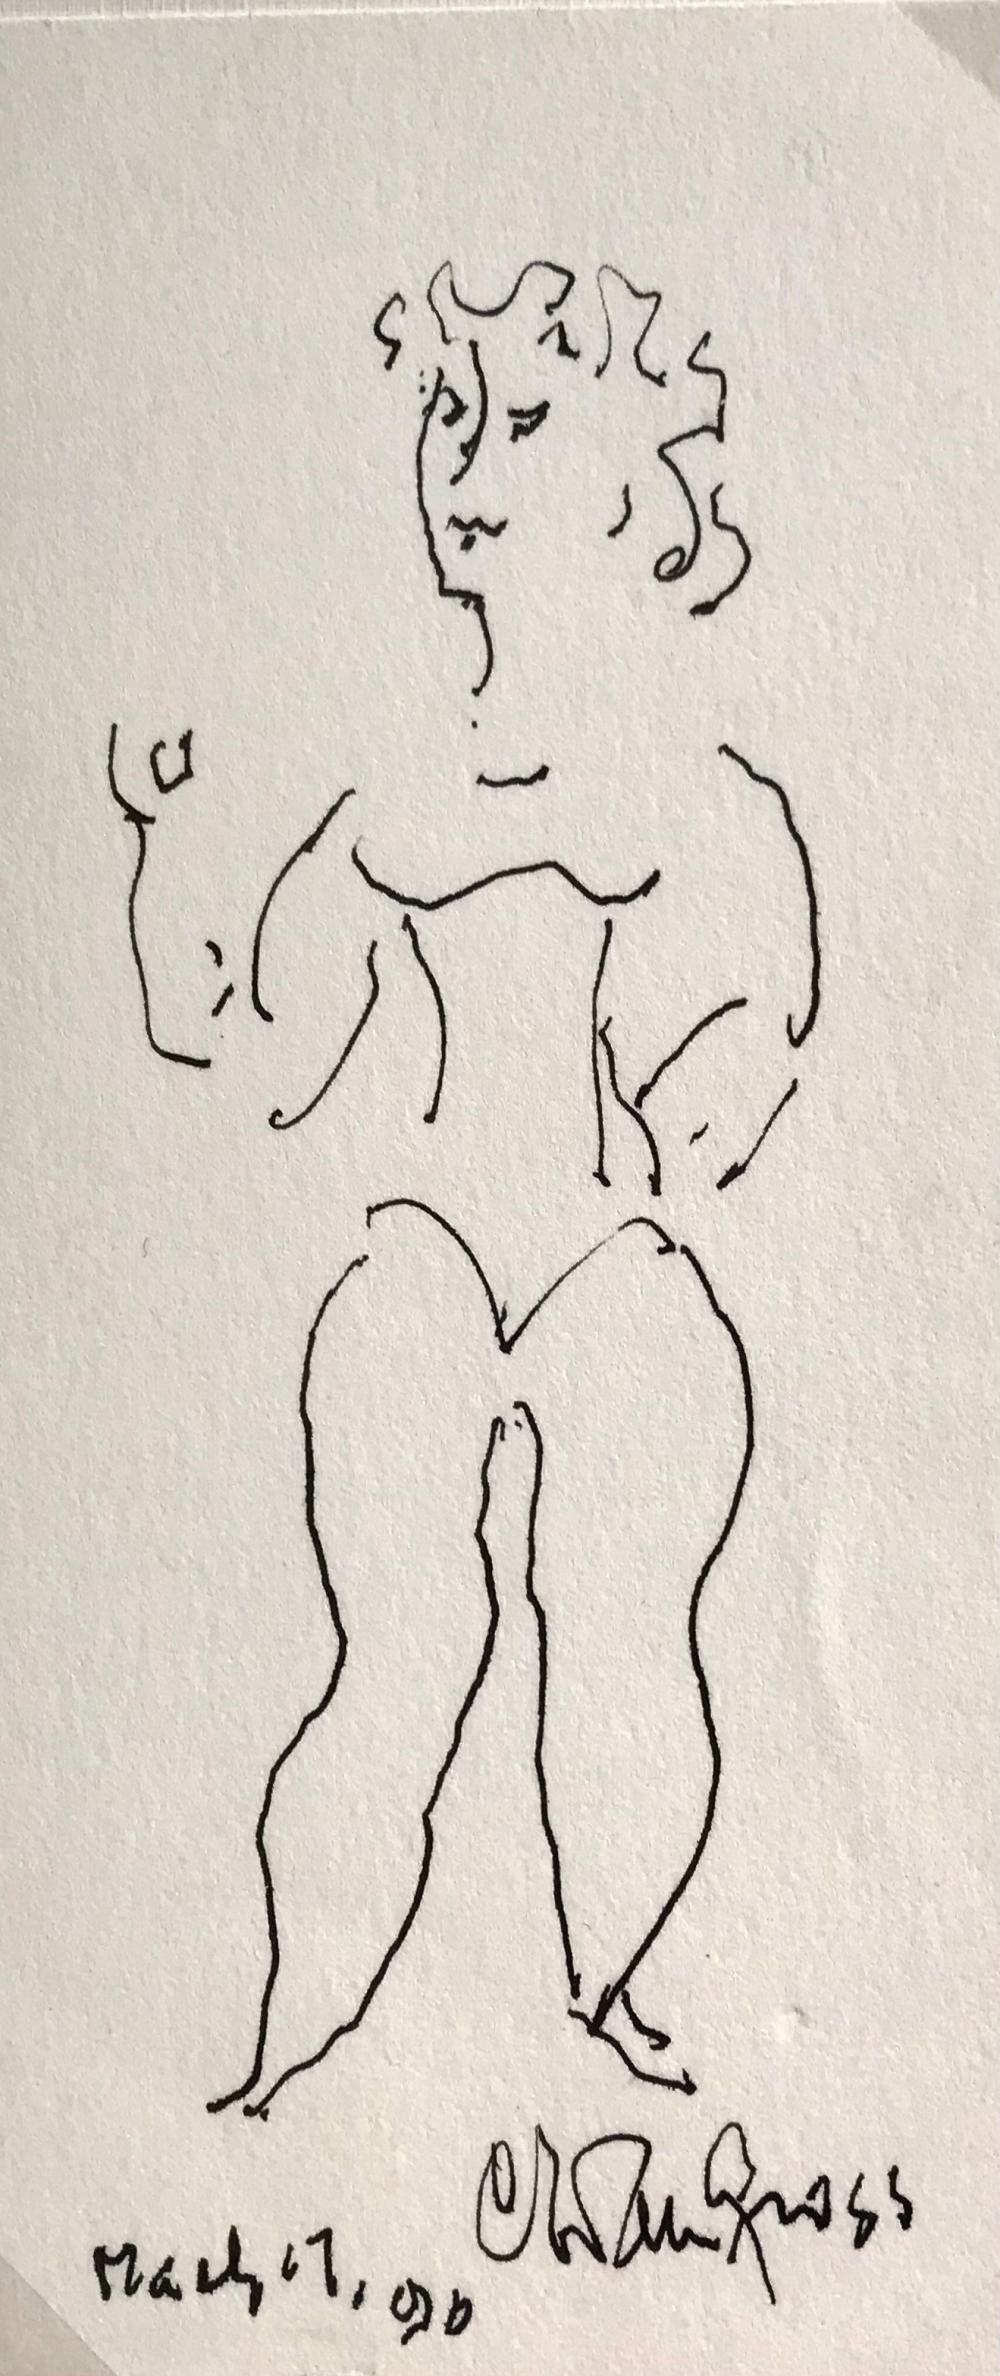 Original Drawing by Chaim Gross, Jewish-American Artist